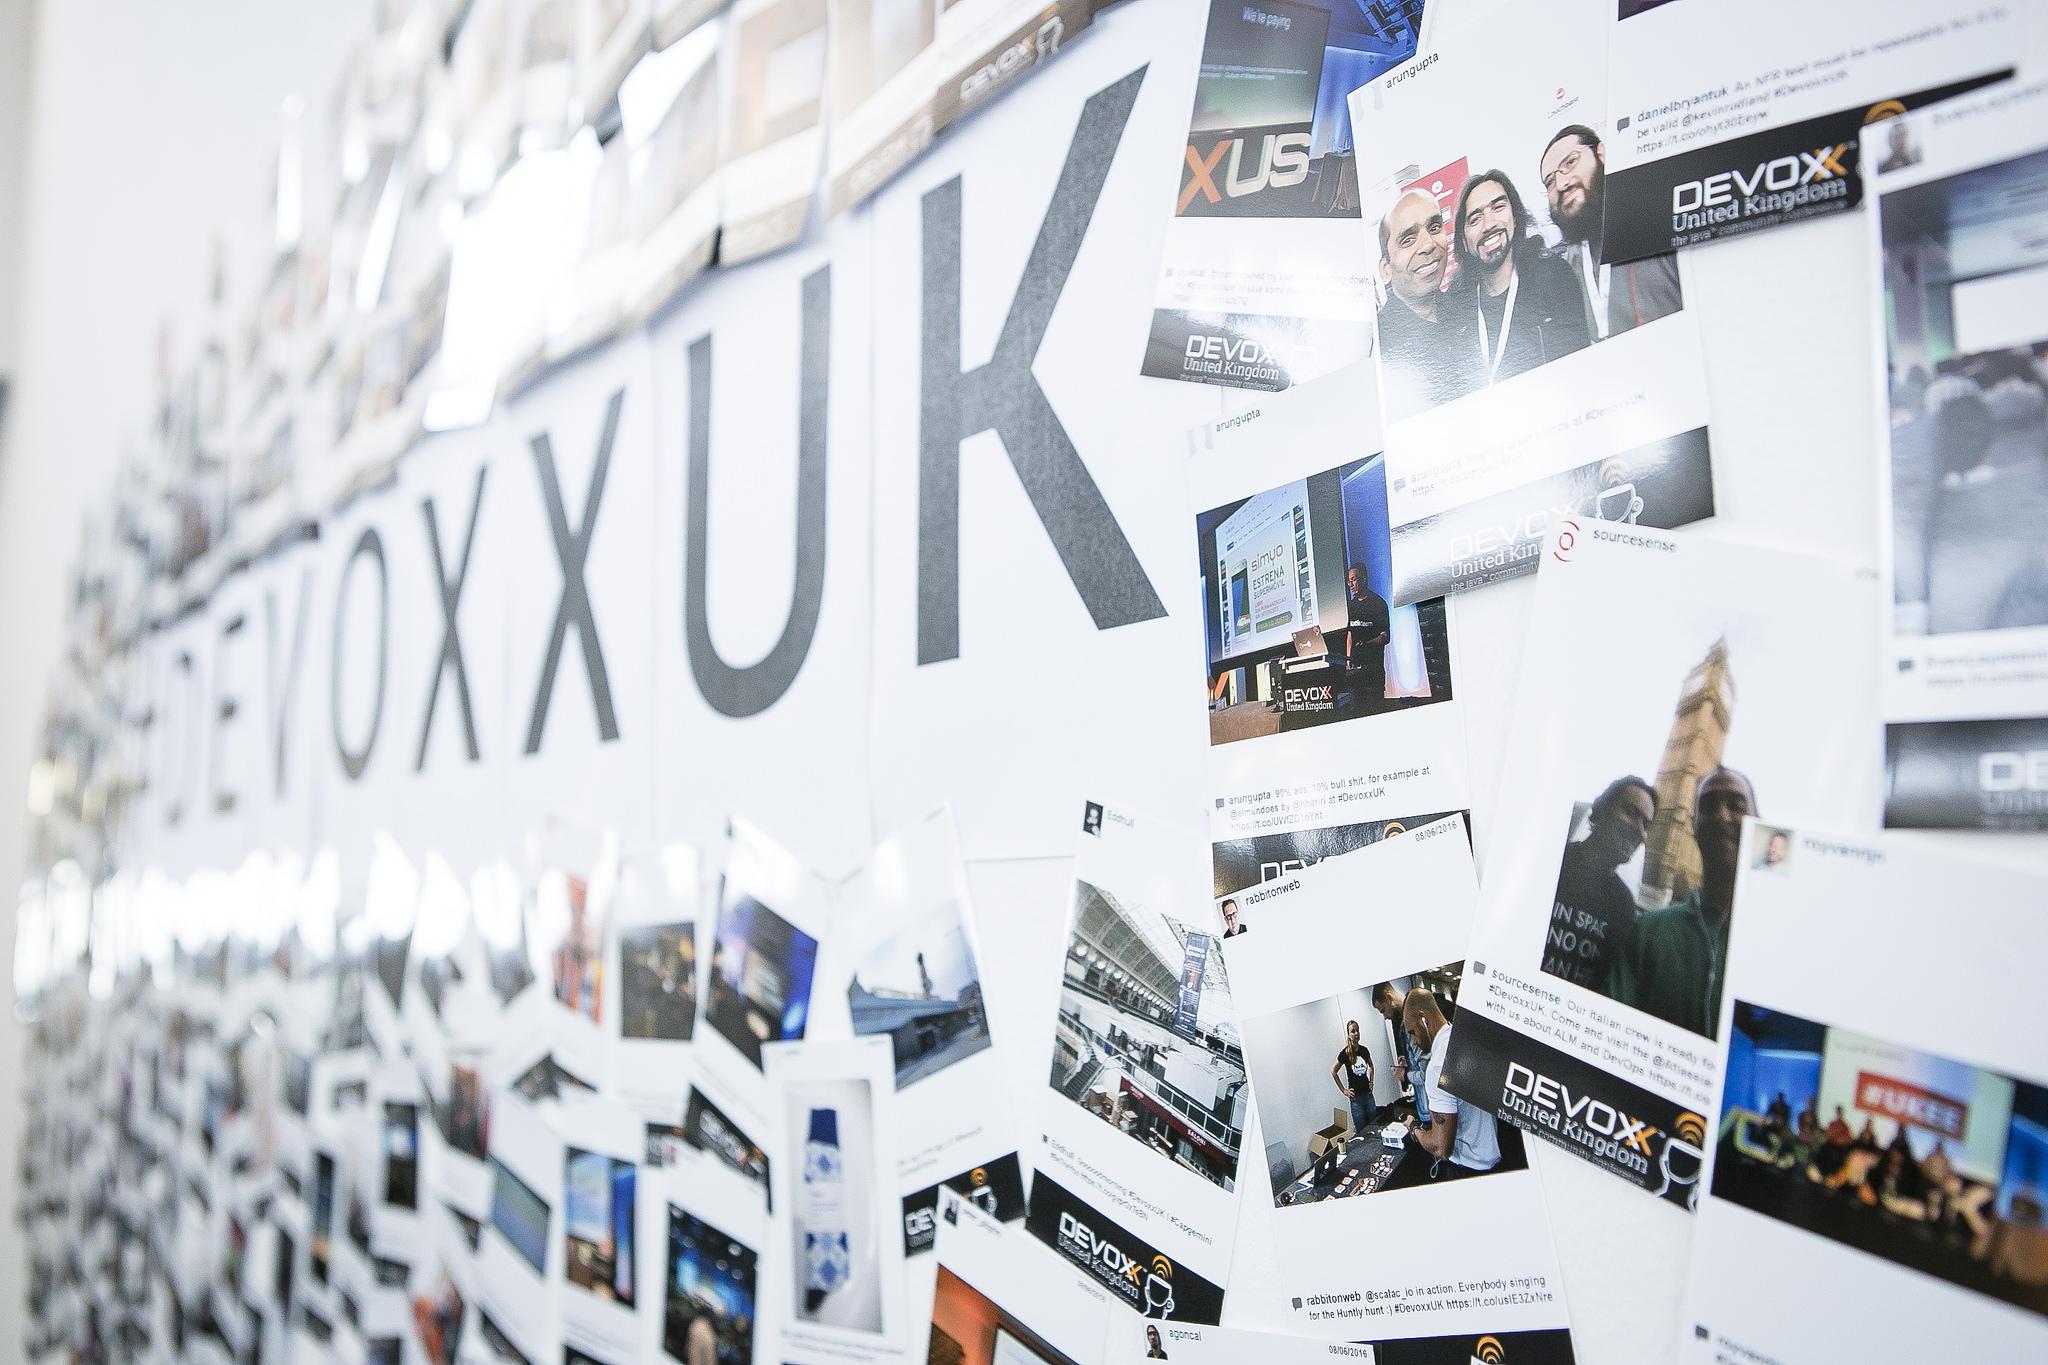 devoxx uk photo wall